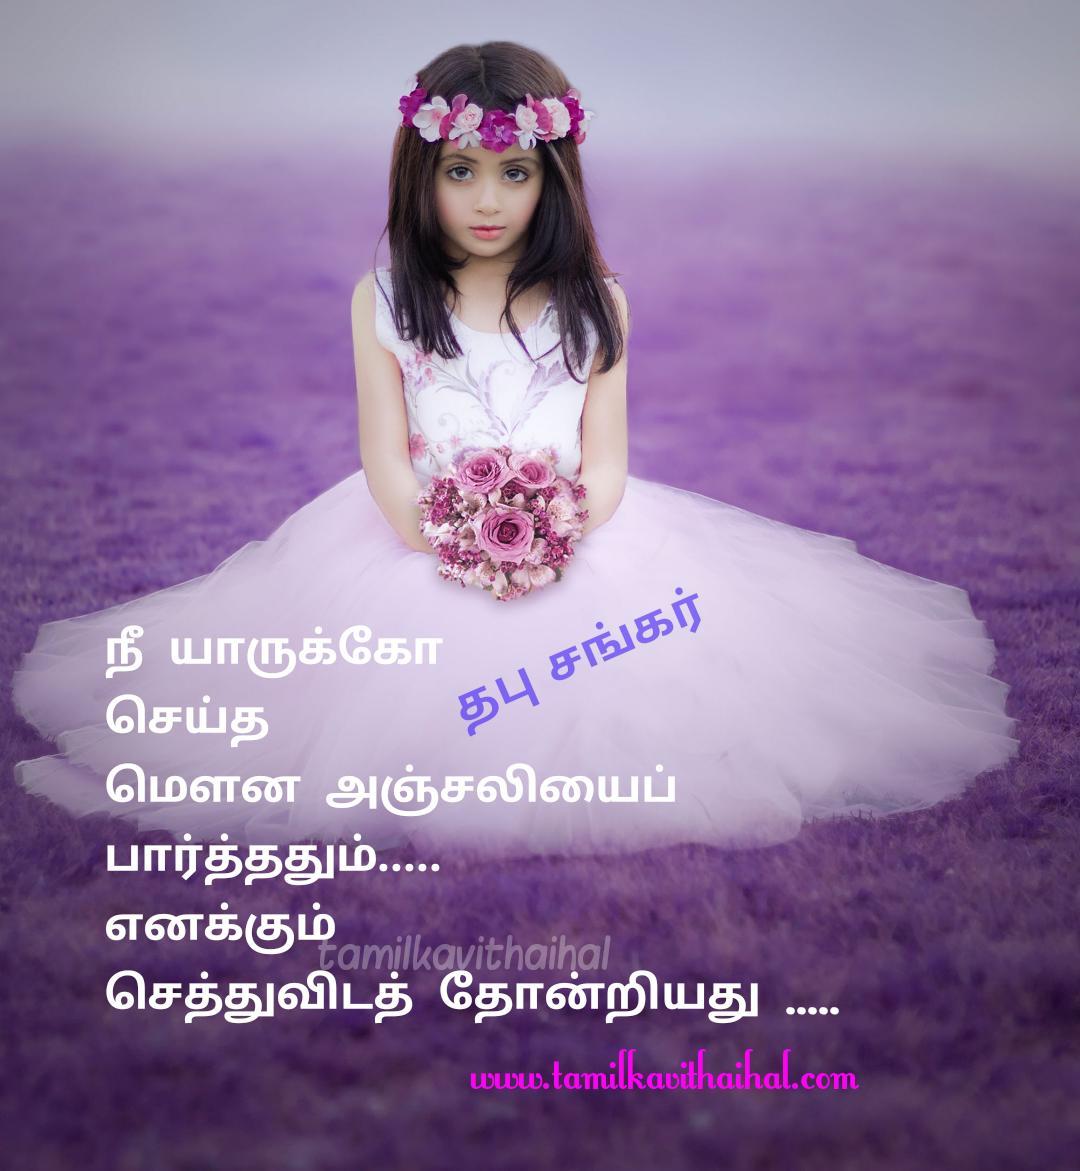 Awesome love feel tamil kadhal kavithaigal thapu sankar lovefeel poem images